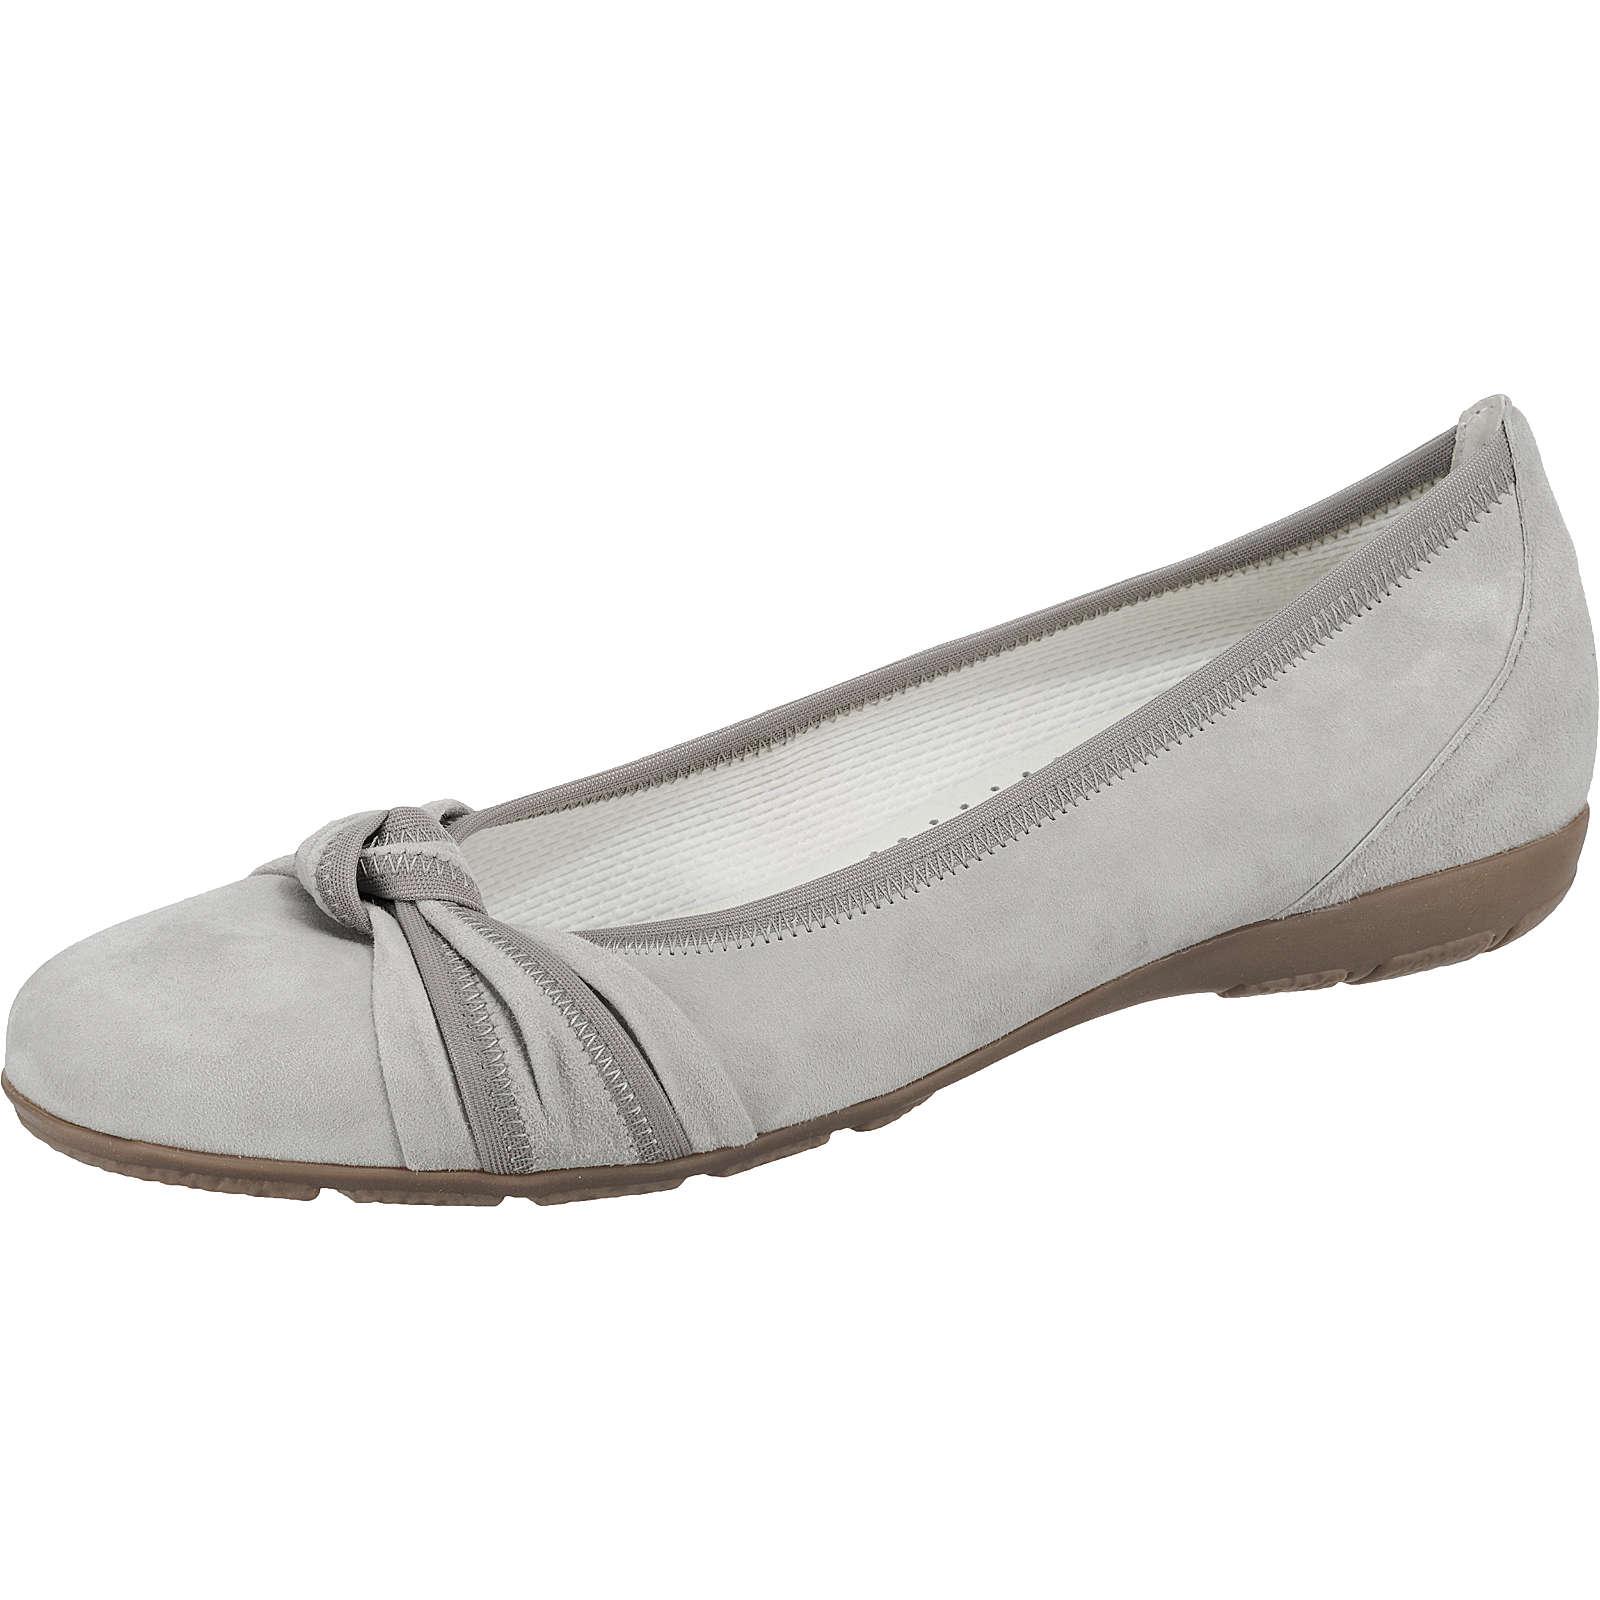 Gabor Klassische Ballerinas grau Damen Gr. 38,5